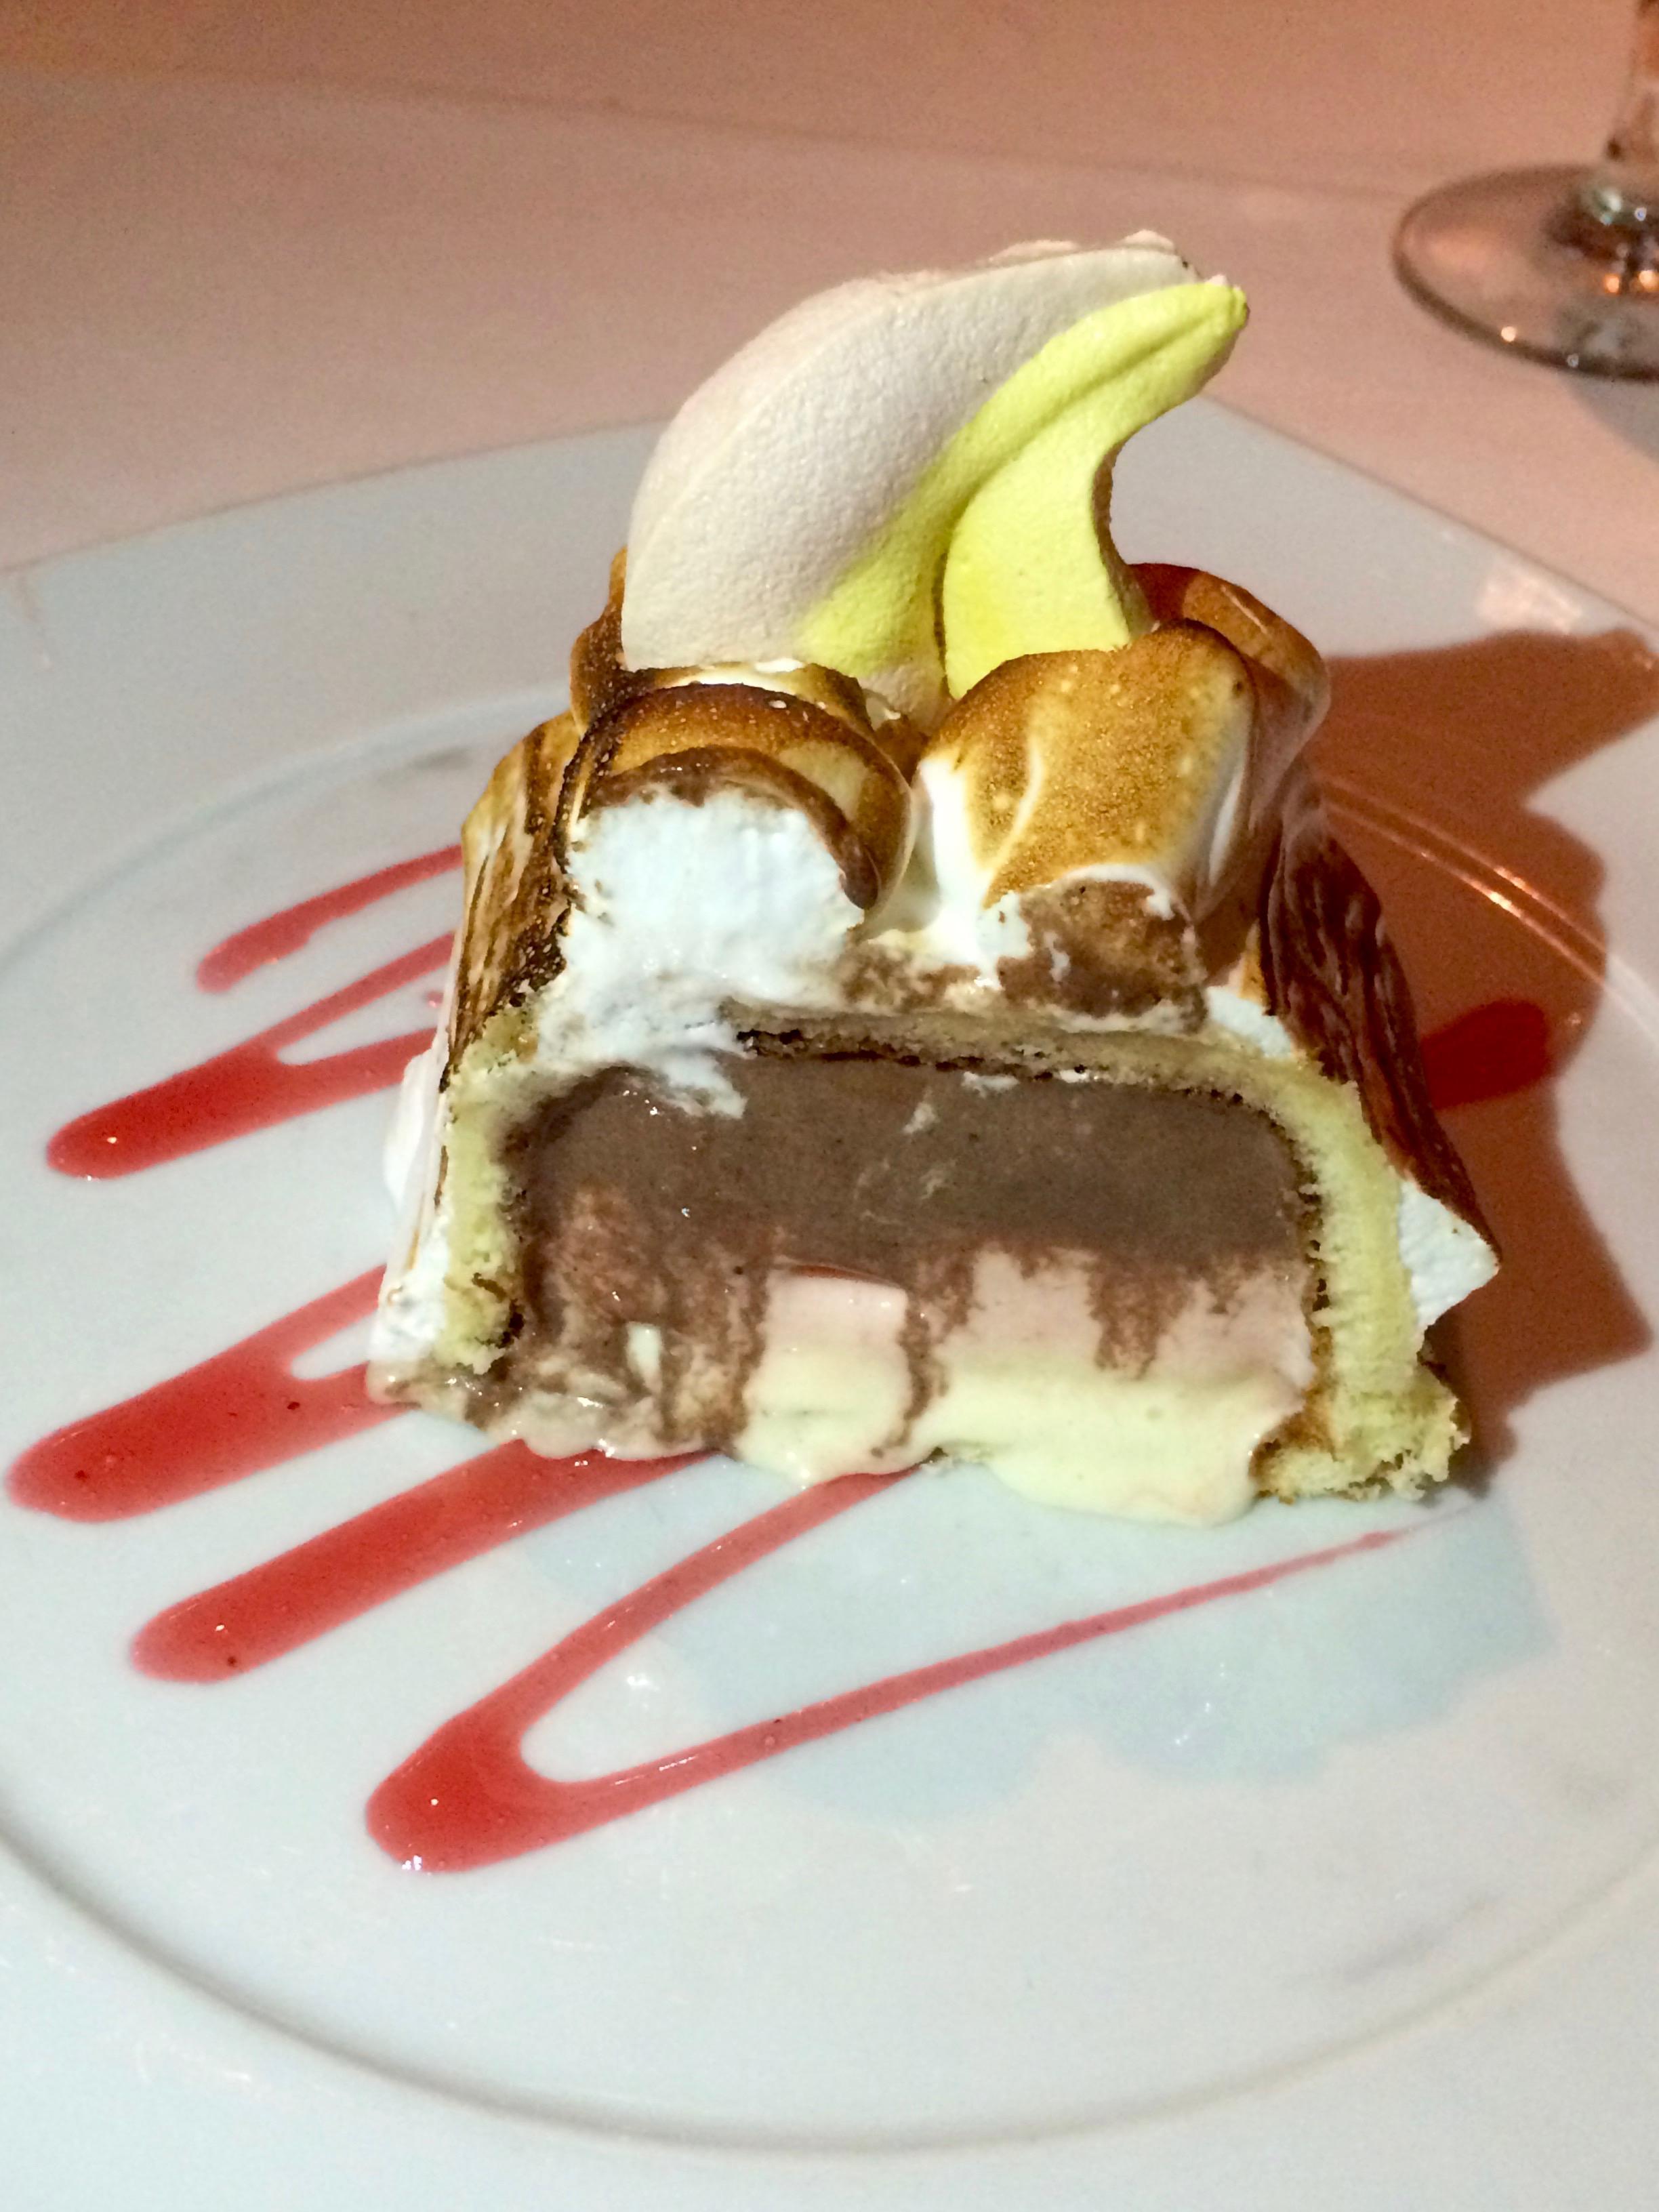 Celebrity Signature Baked Alaska - neapolitan ice cream covered with vanilla sponge and a soft meringue